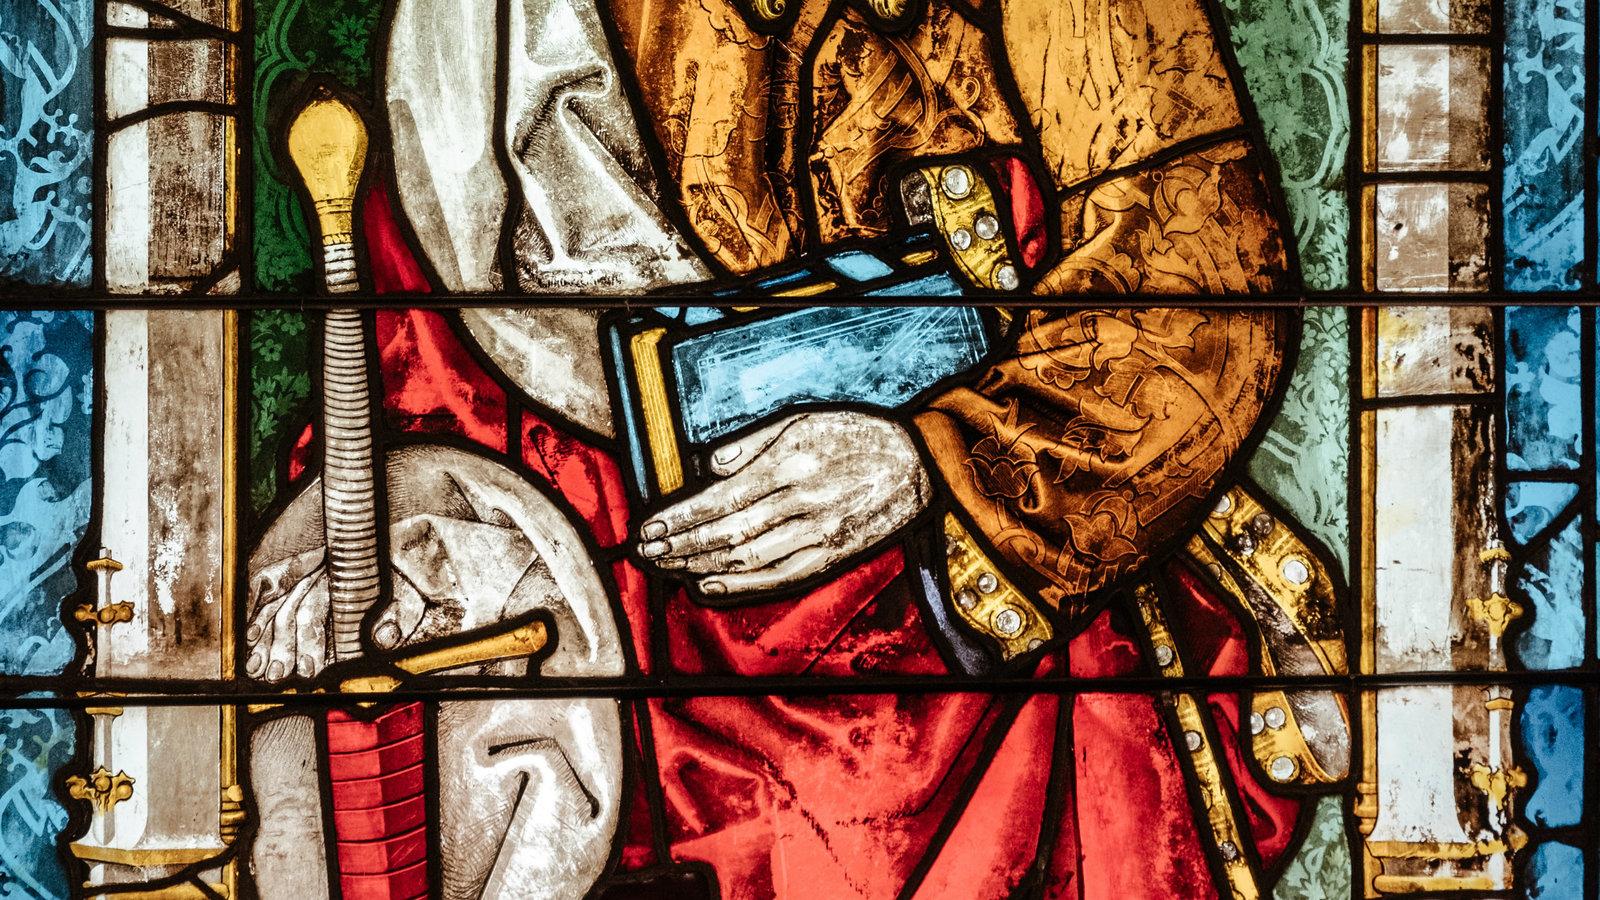 Does God Really Save Us by Faith Alone?